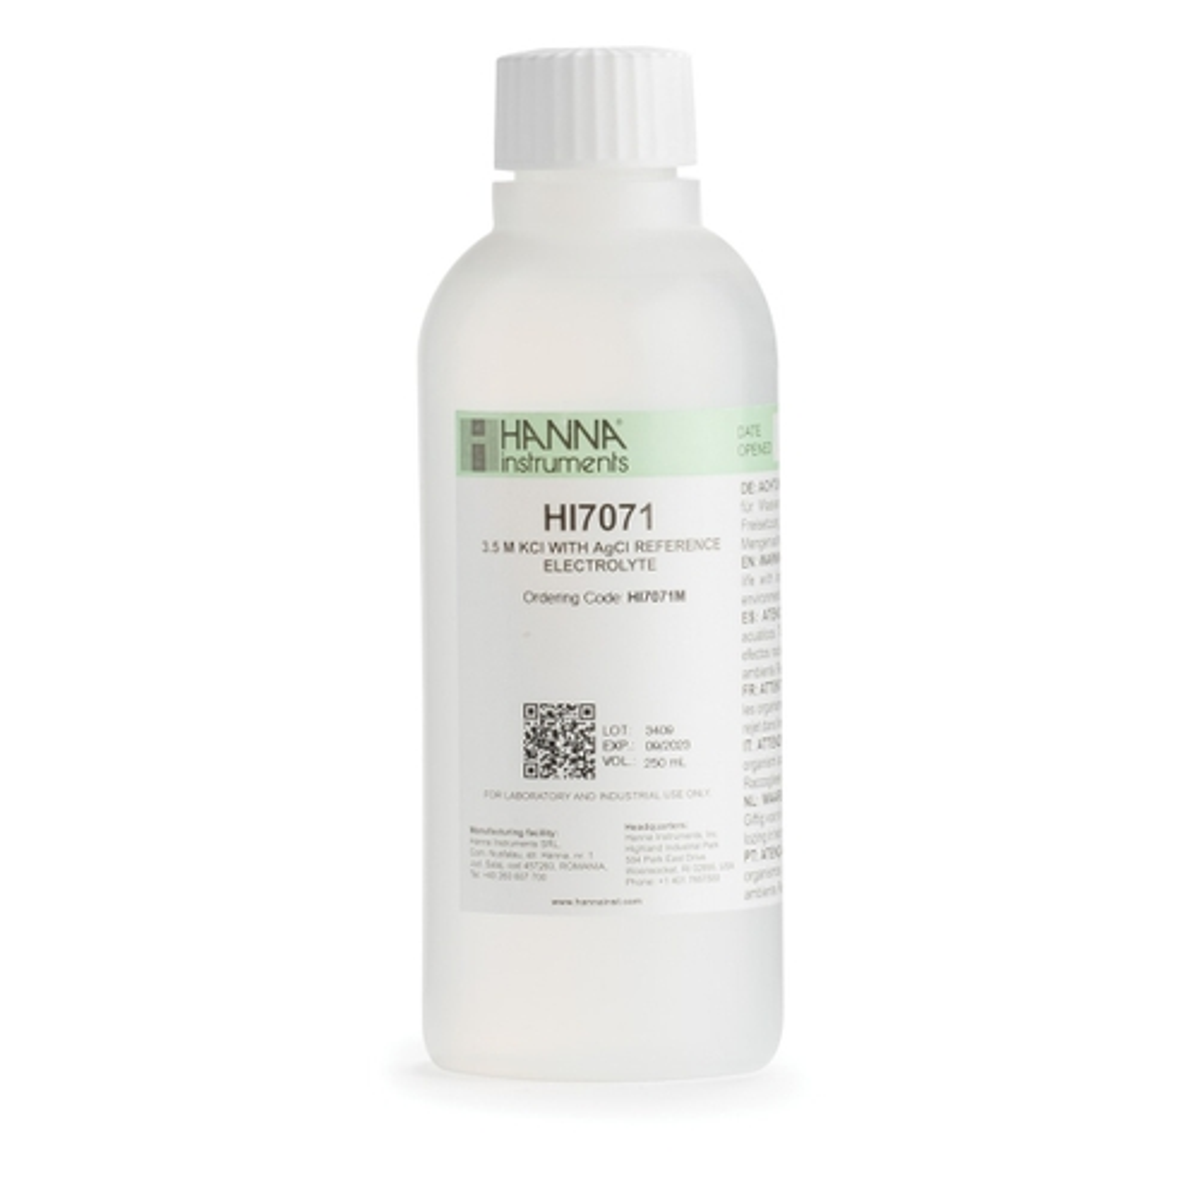 HI7071M Electrolyte Fill Solution, 3.5M KCl + AgCl (230 mL)